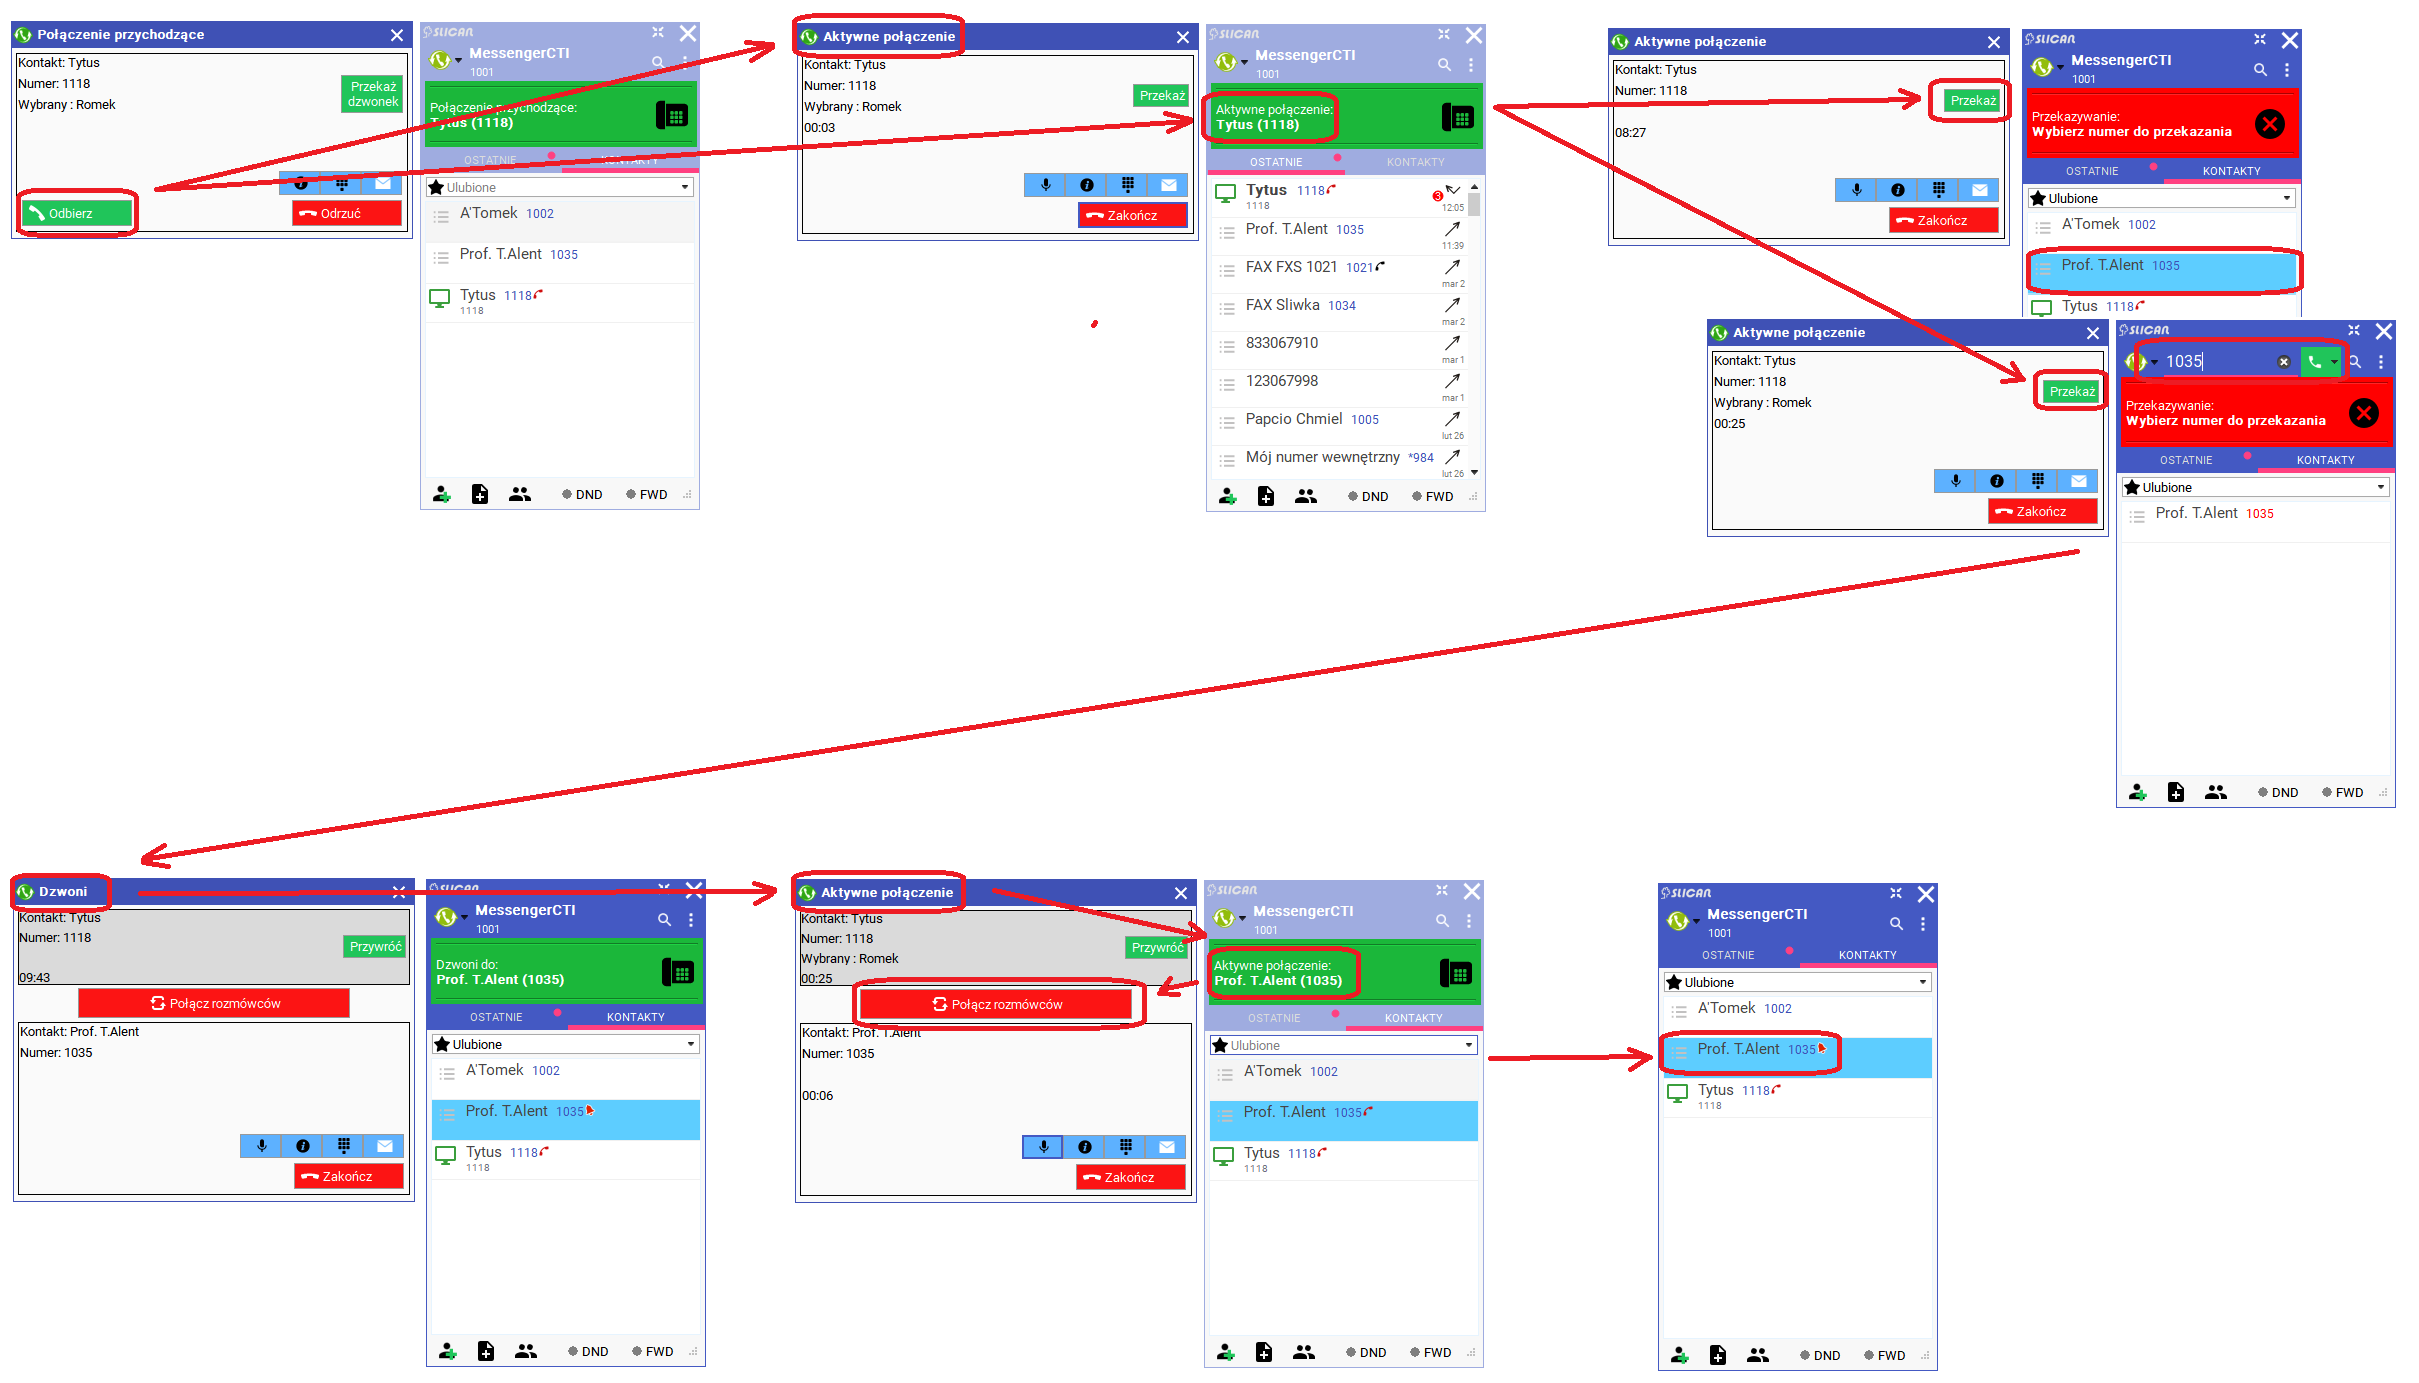 MessengerCTI.Desktop - etapy przezkazania połaczenia.png